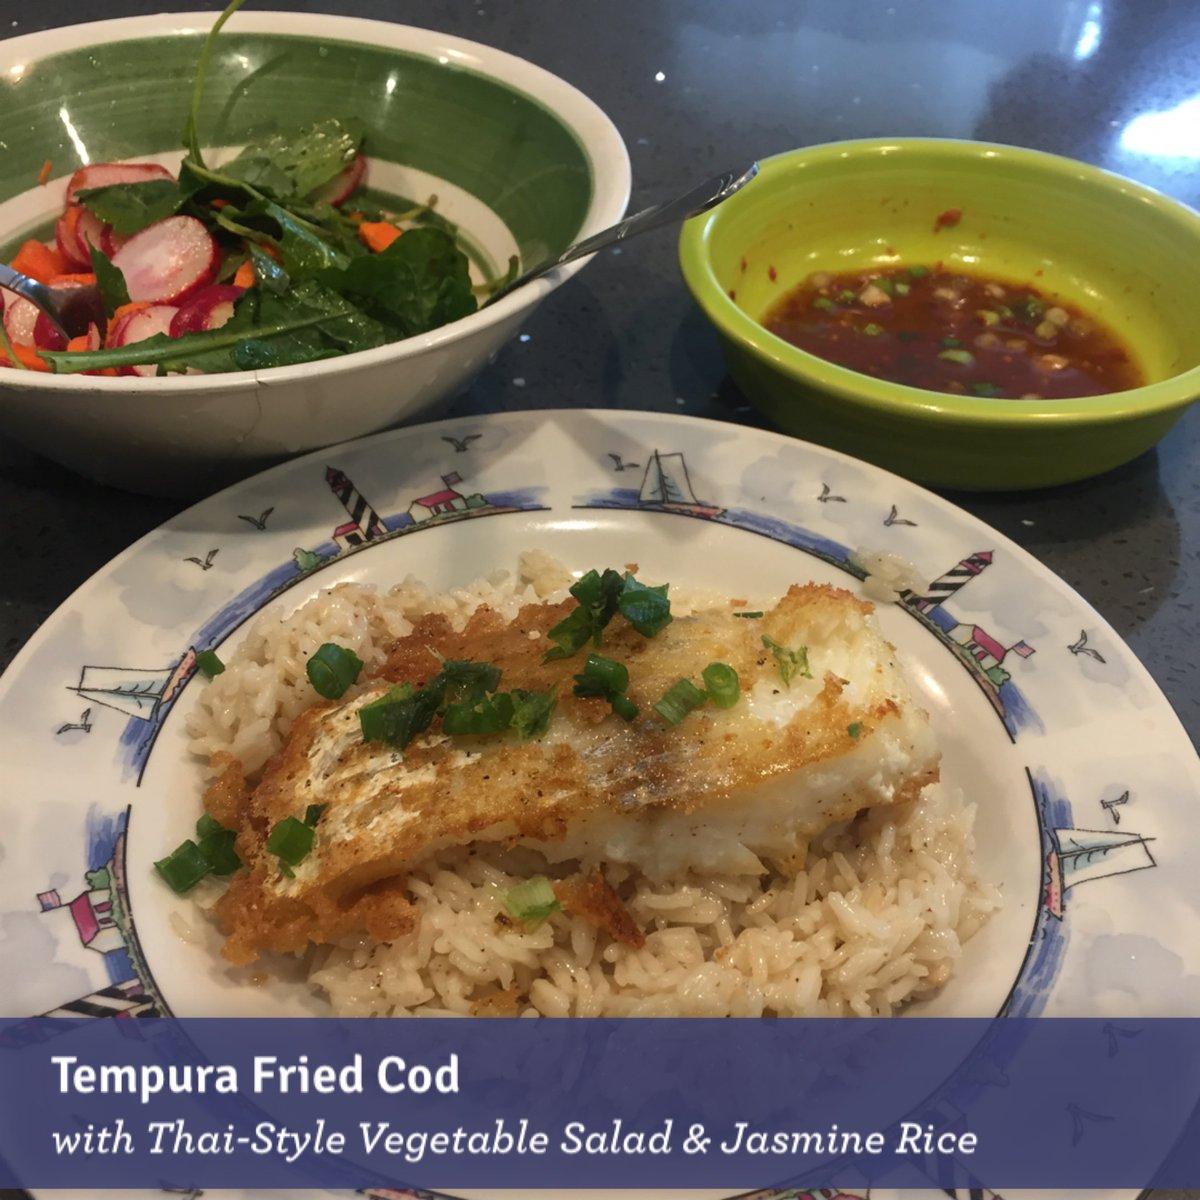 Blue apron tempura cod - 0 Replies 0 Retweets 0 Likes